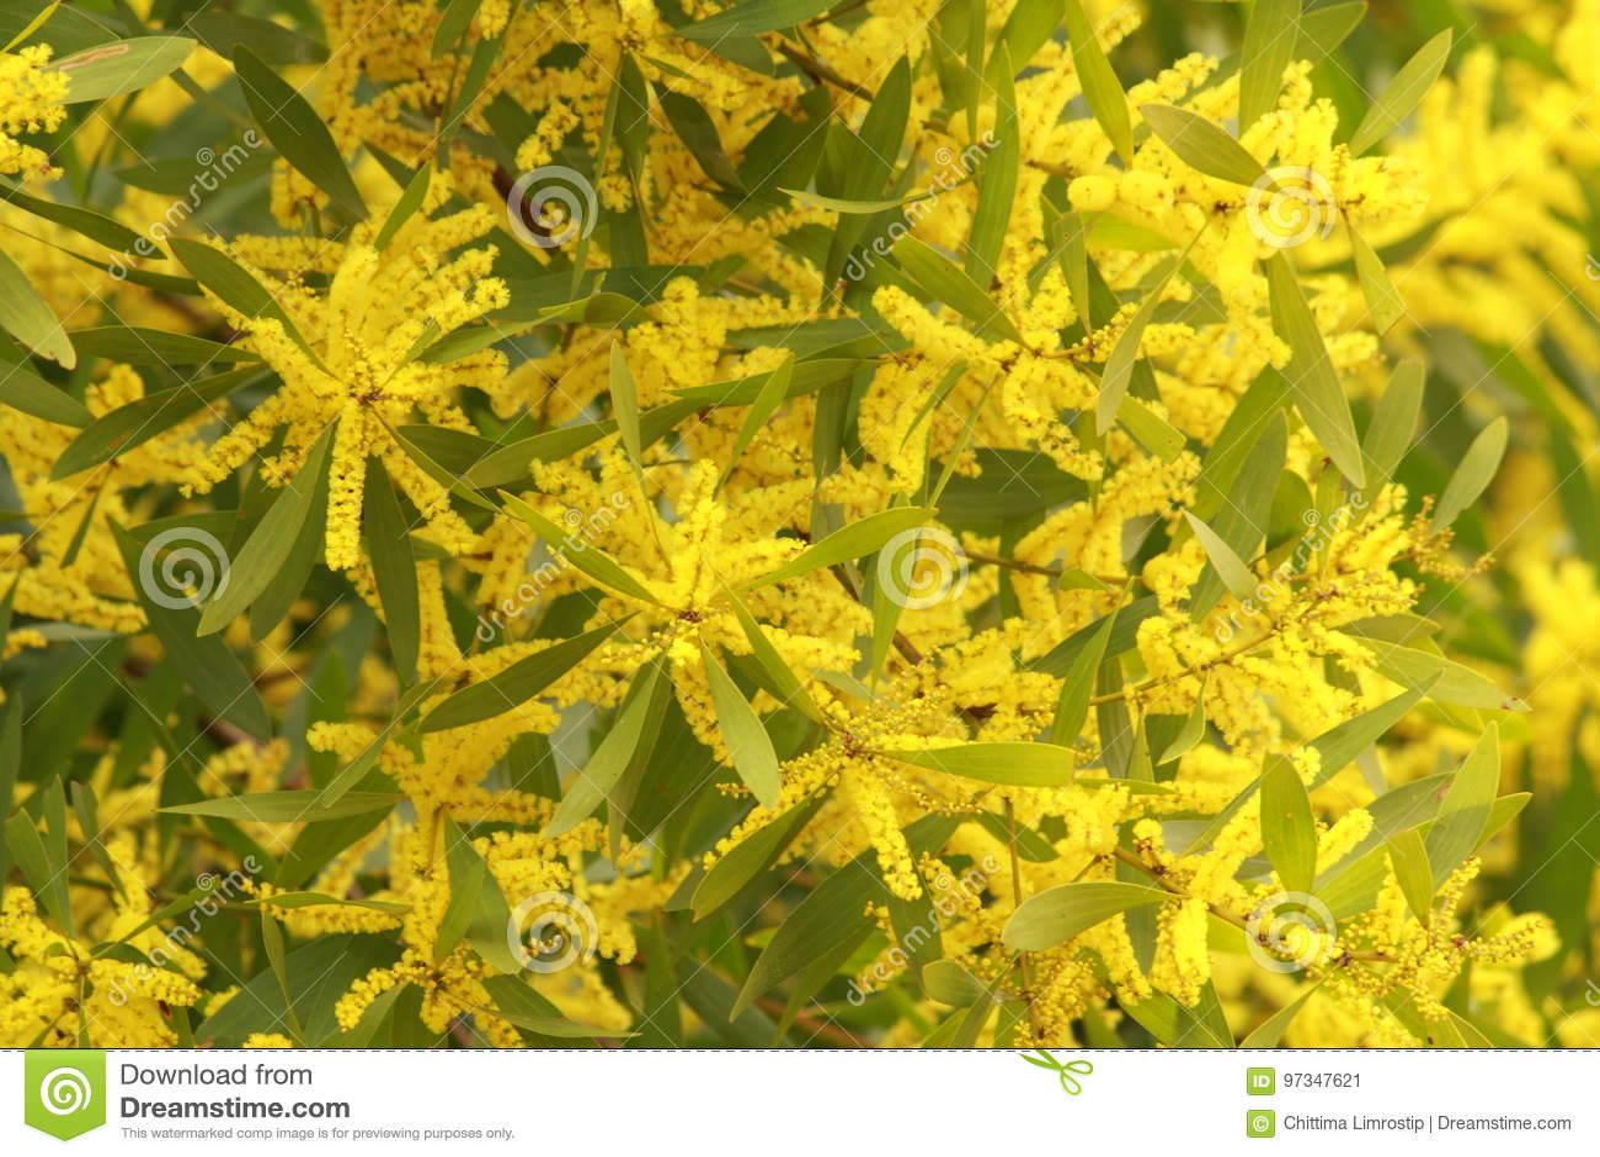 Australian yellow flowers stock image image of aroma 97347621 australian yellow flowers mightylinksfo